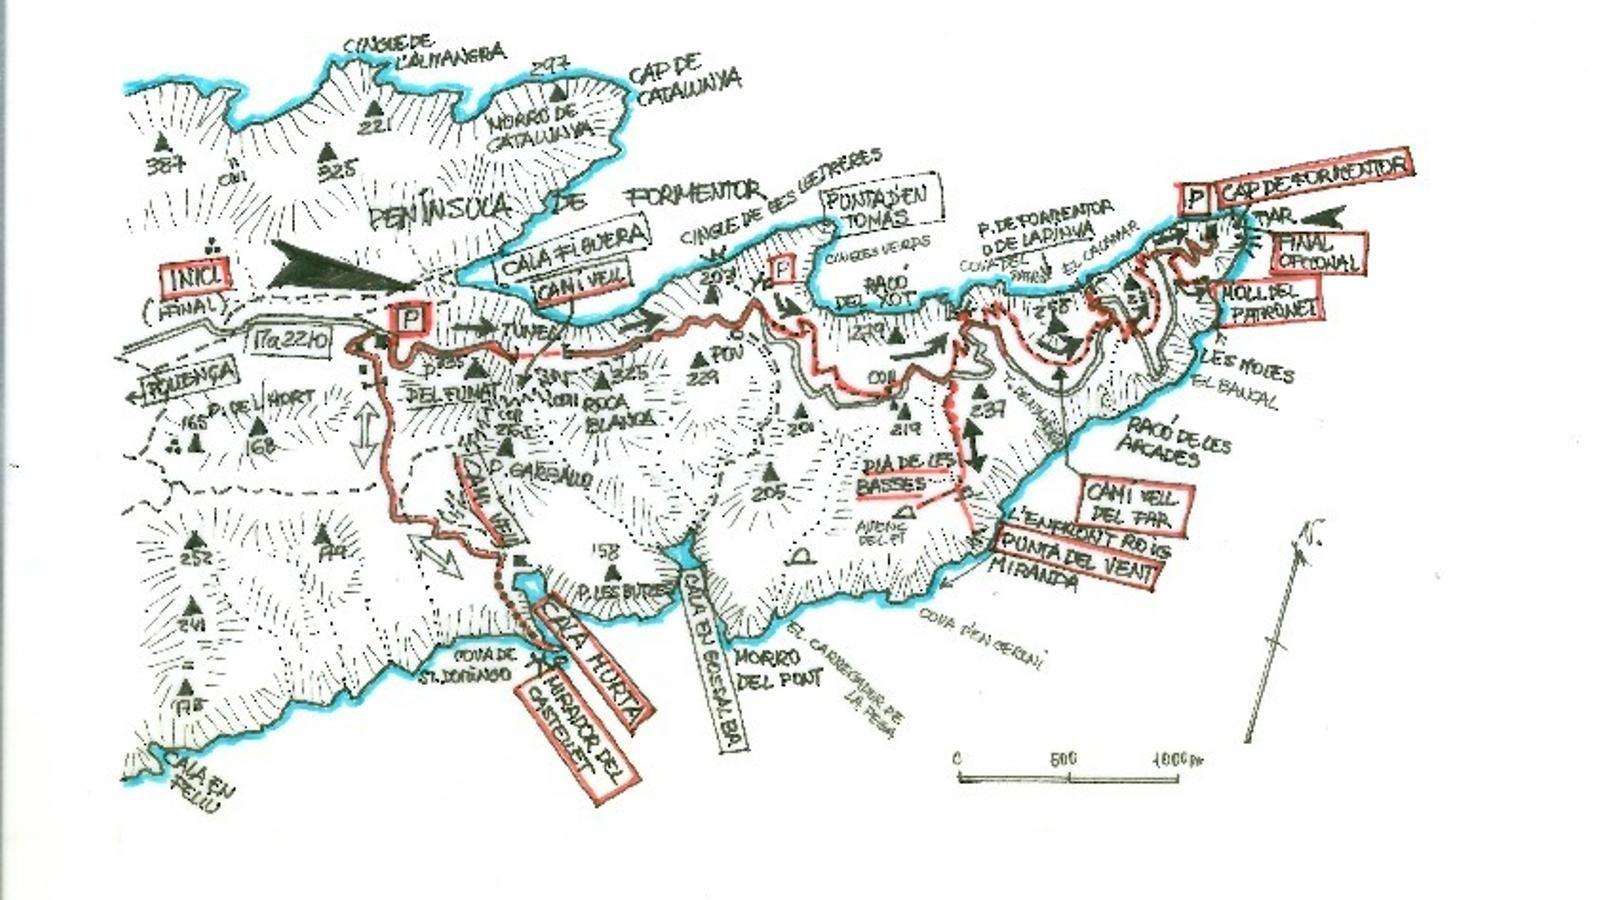 Formentor, l'extrem tramuntanal